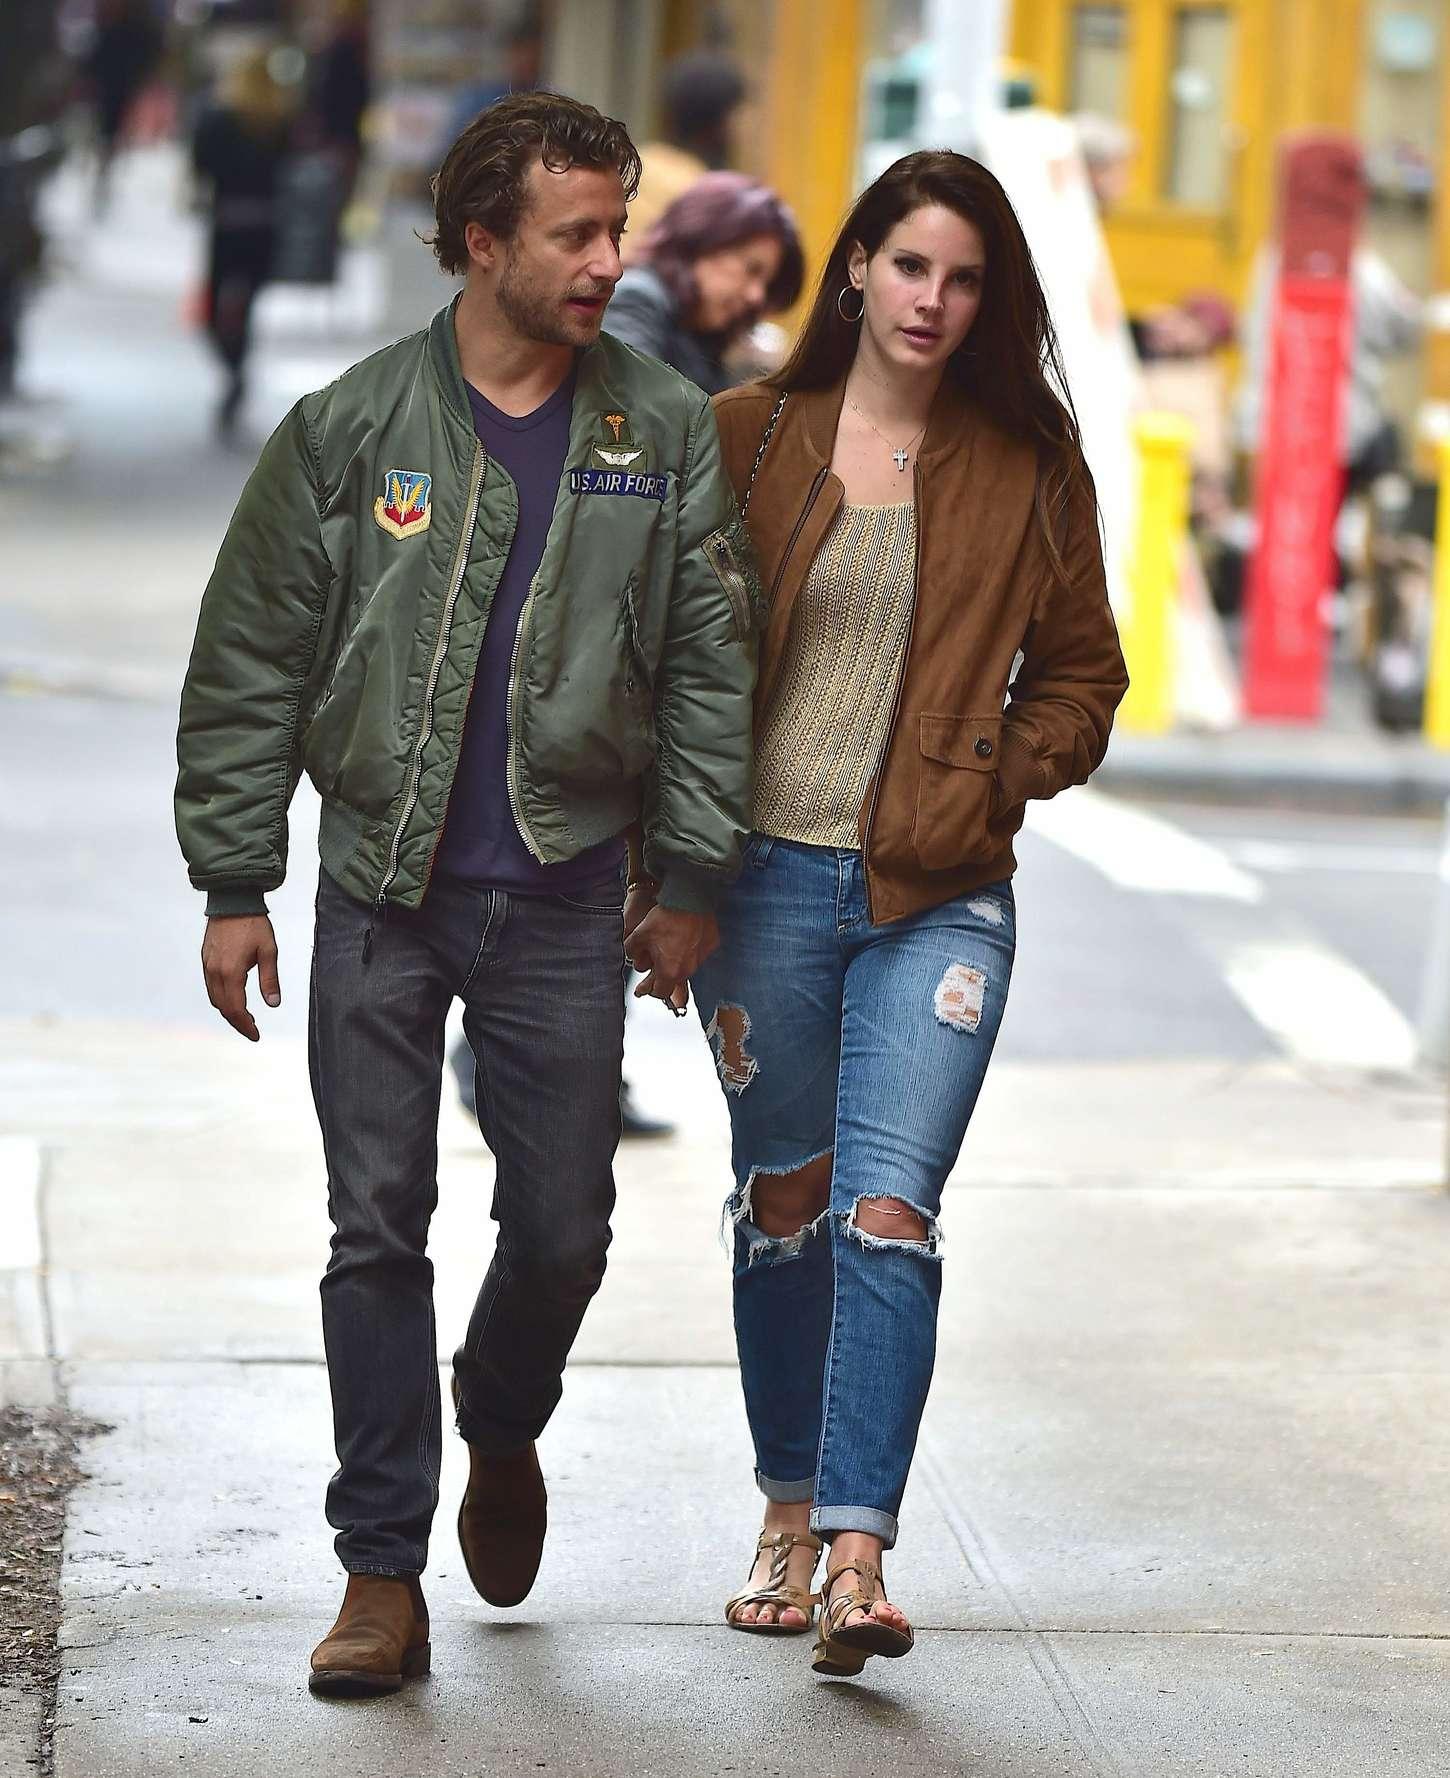 Lana Del Rey with Francesco Carrozzini out in Soho